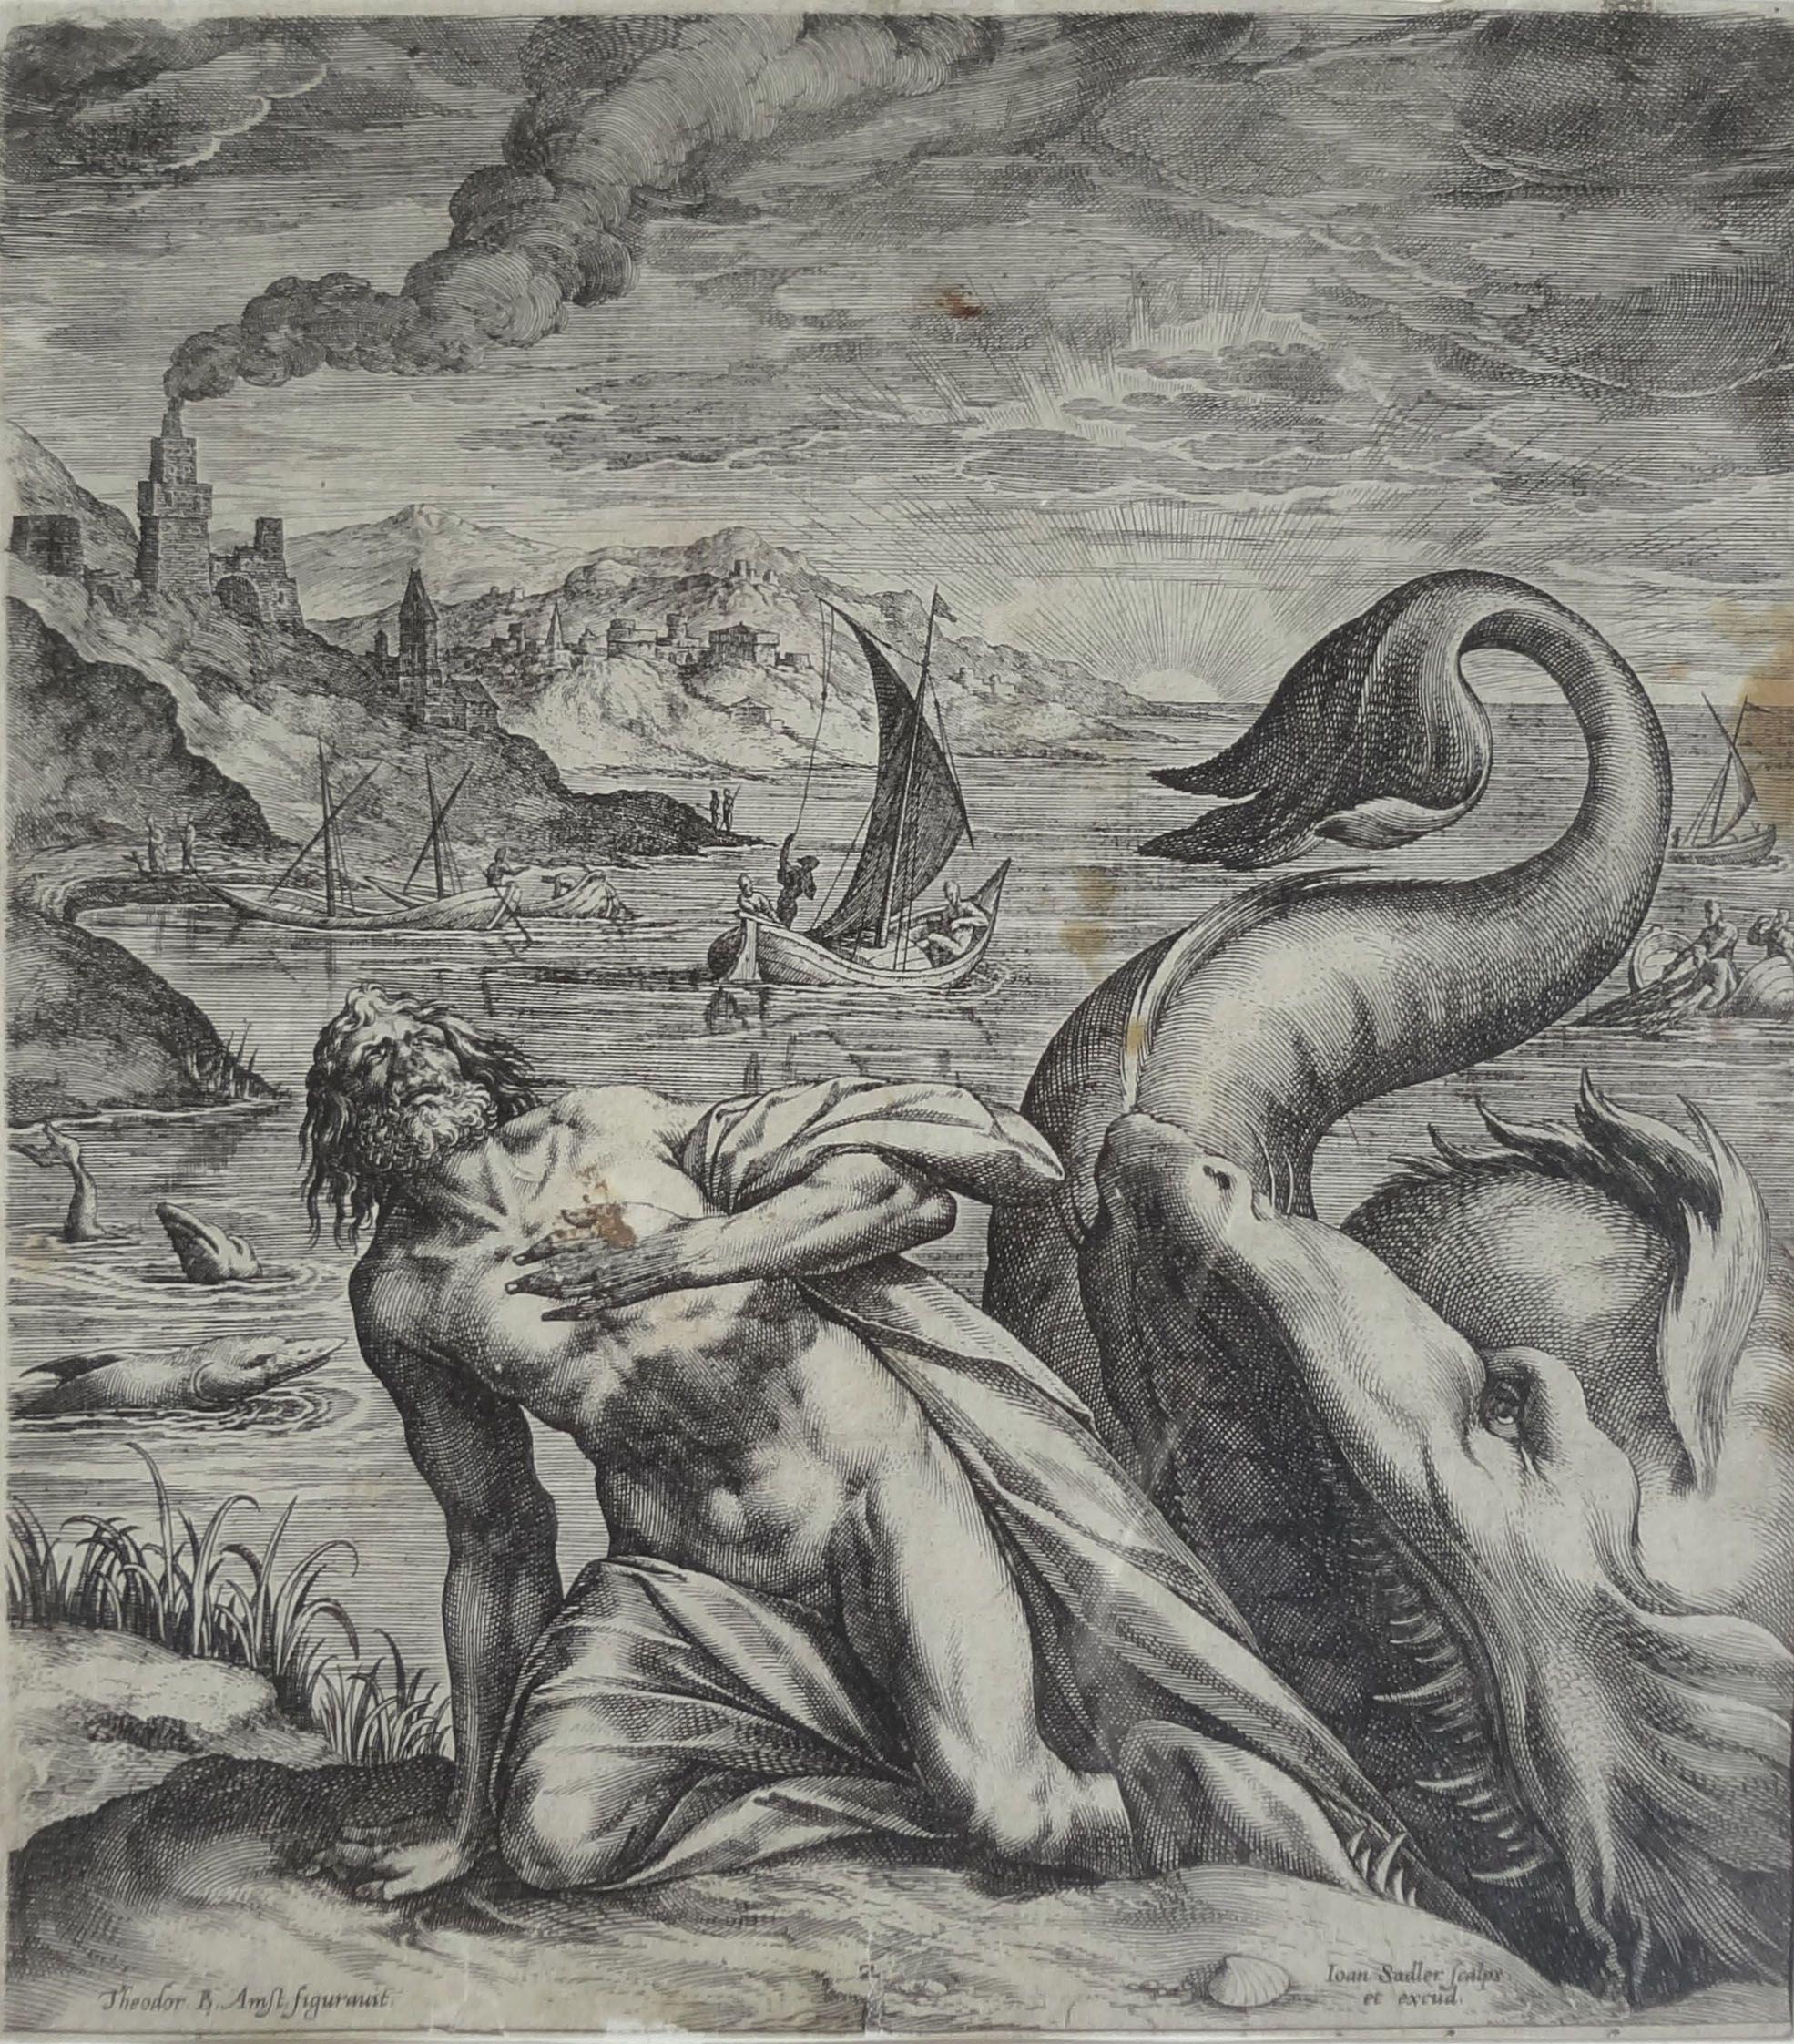 After-Maerten-de-Vos-Jonah-cast-onto-shore-by-the-sea-monster-1580s-copy.jpg (1970×2244)